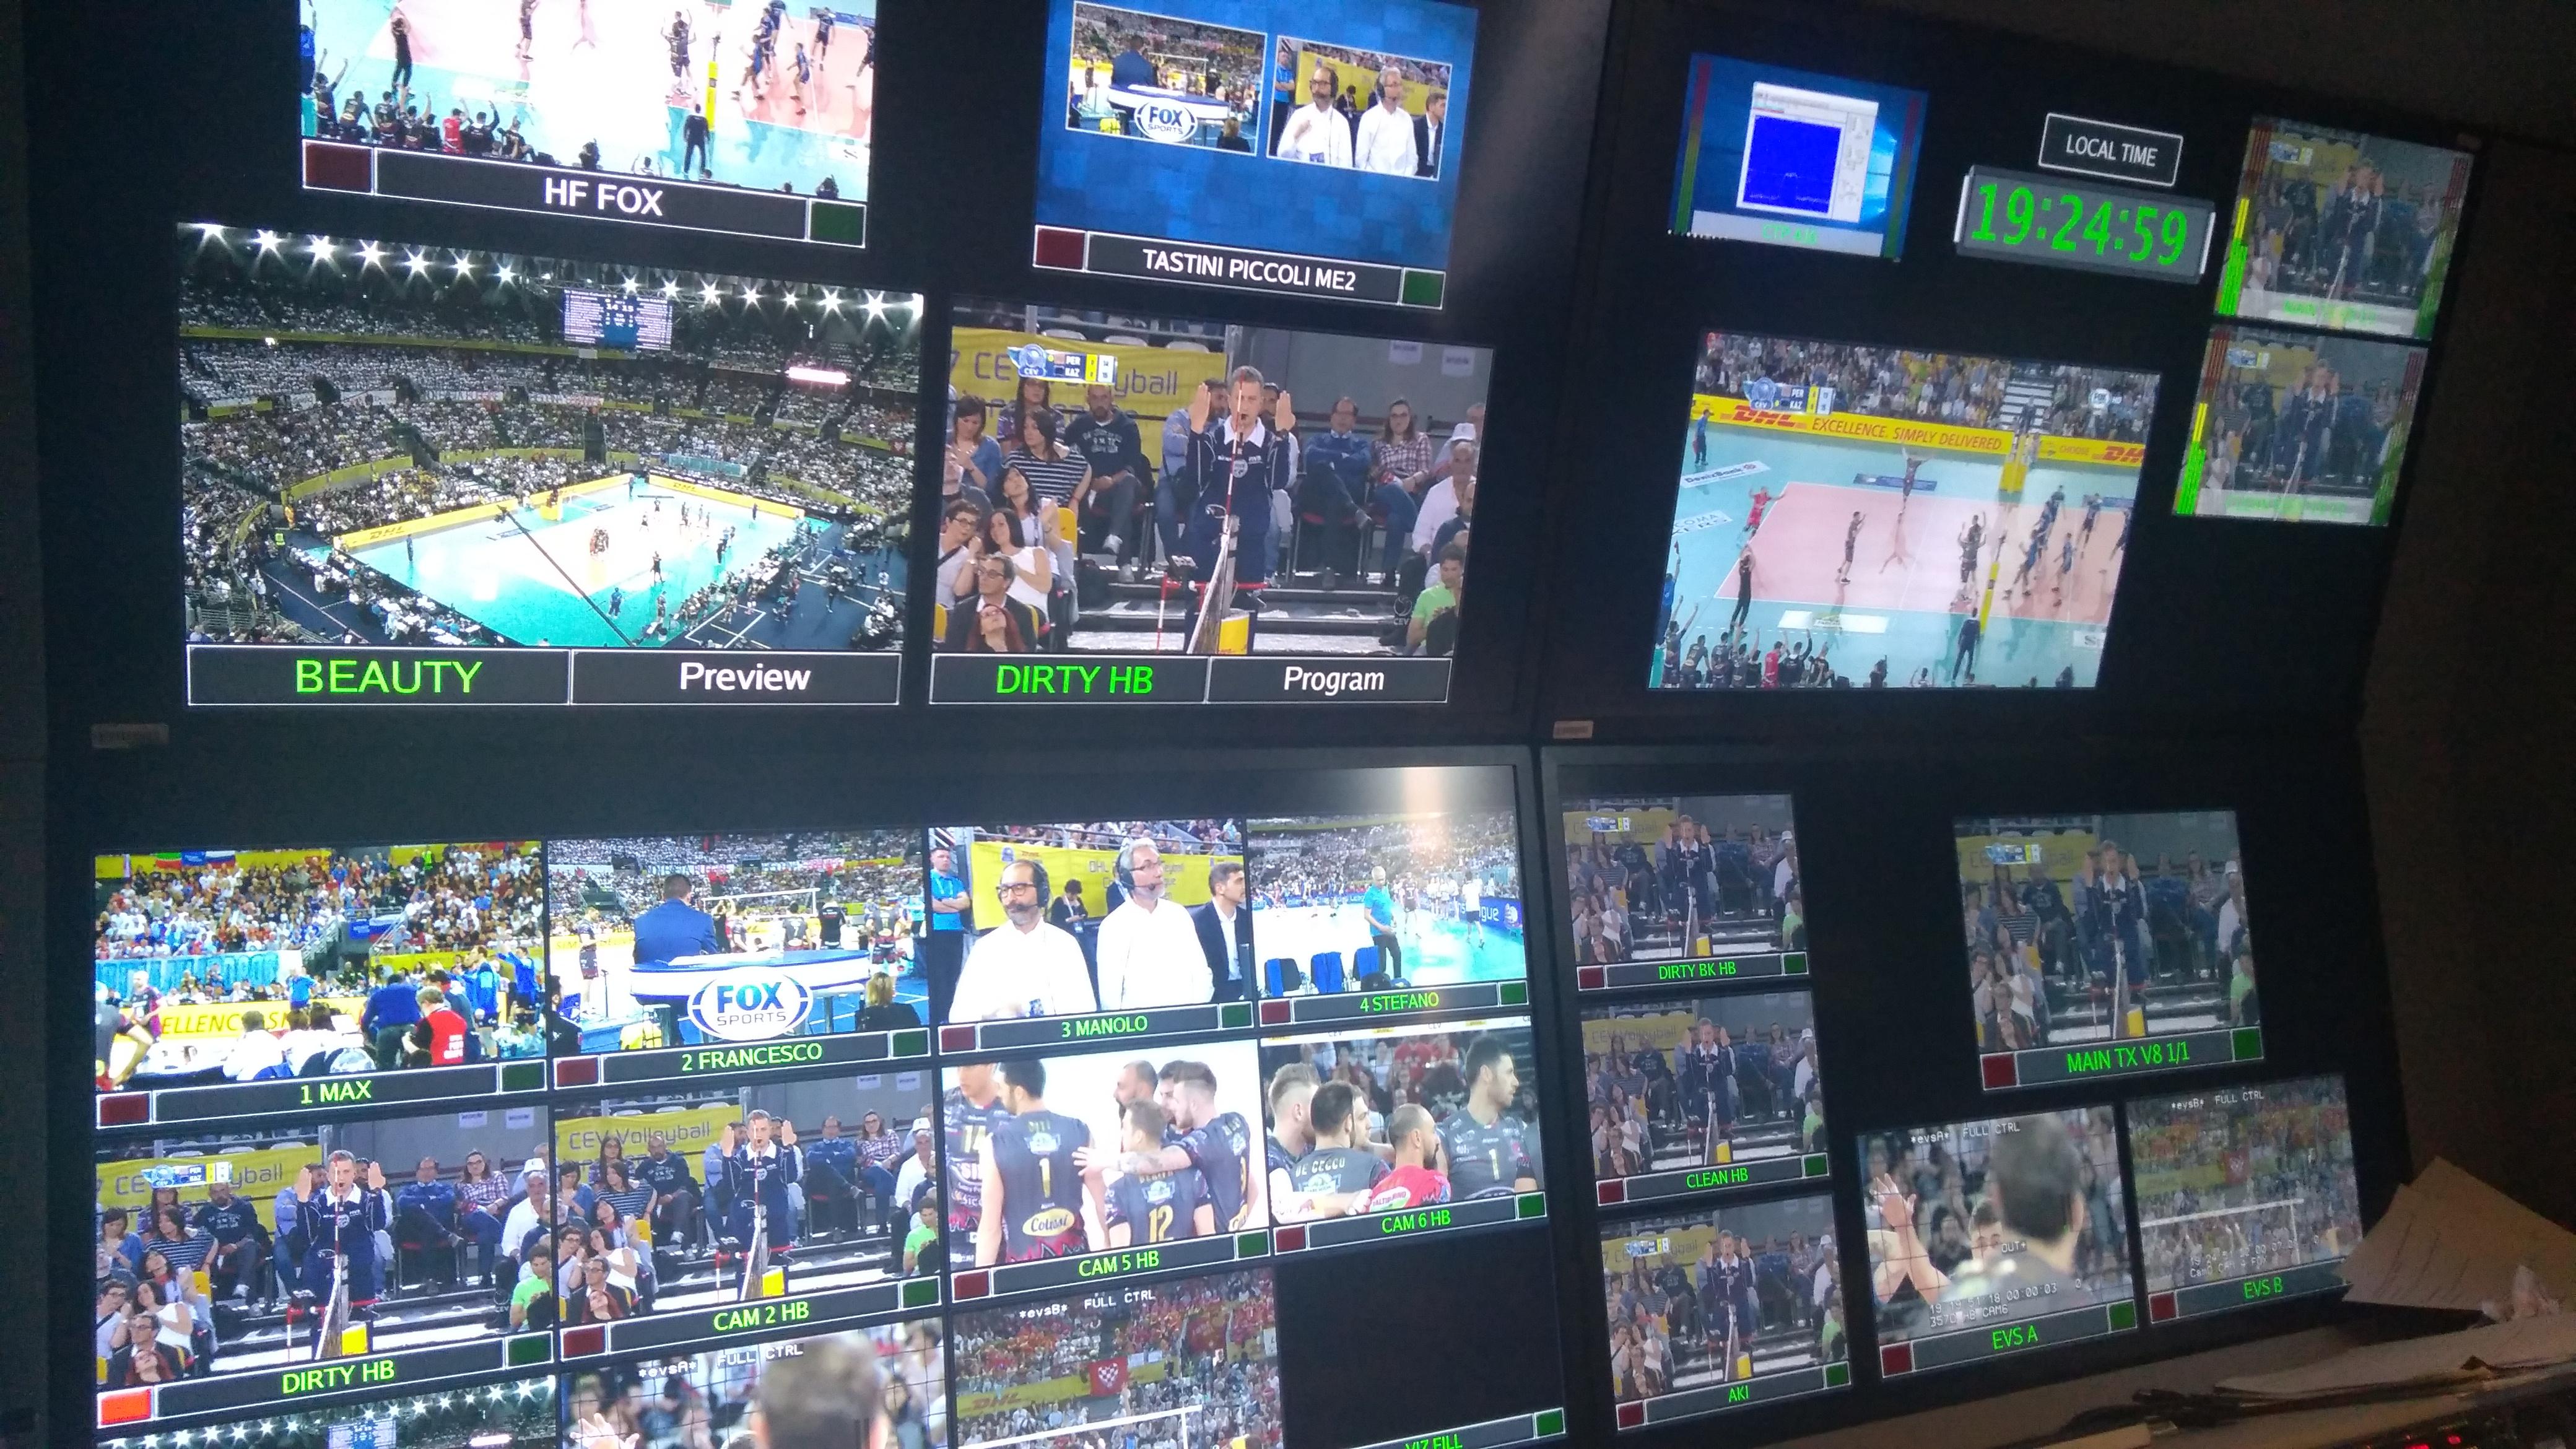 CEV volley FoxSport Videe